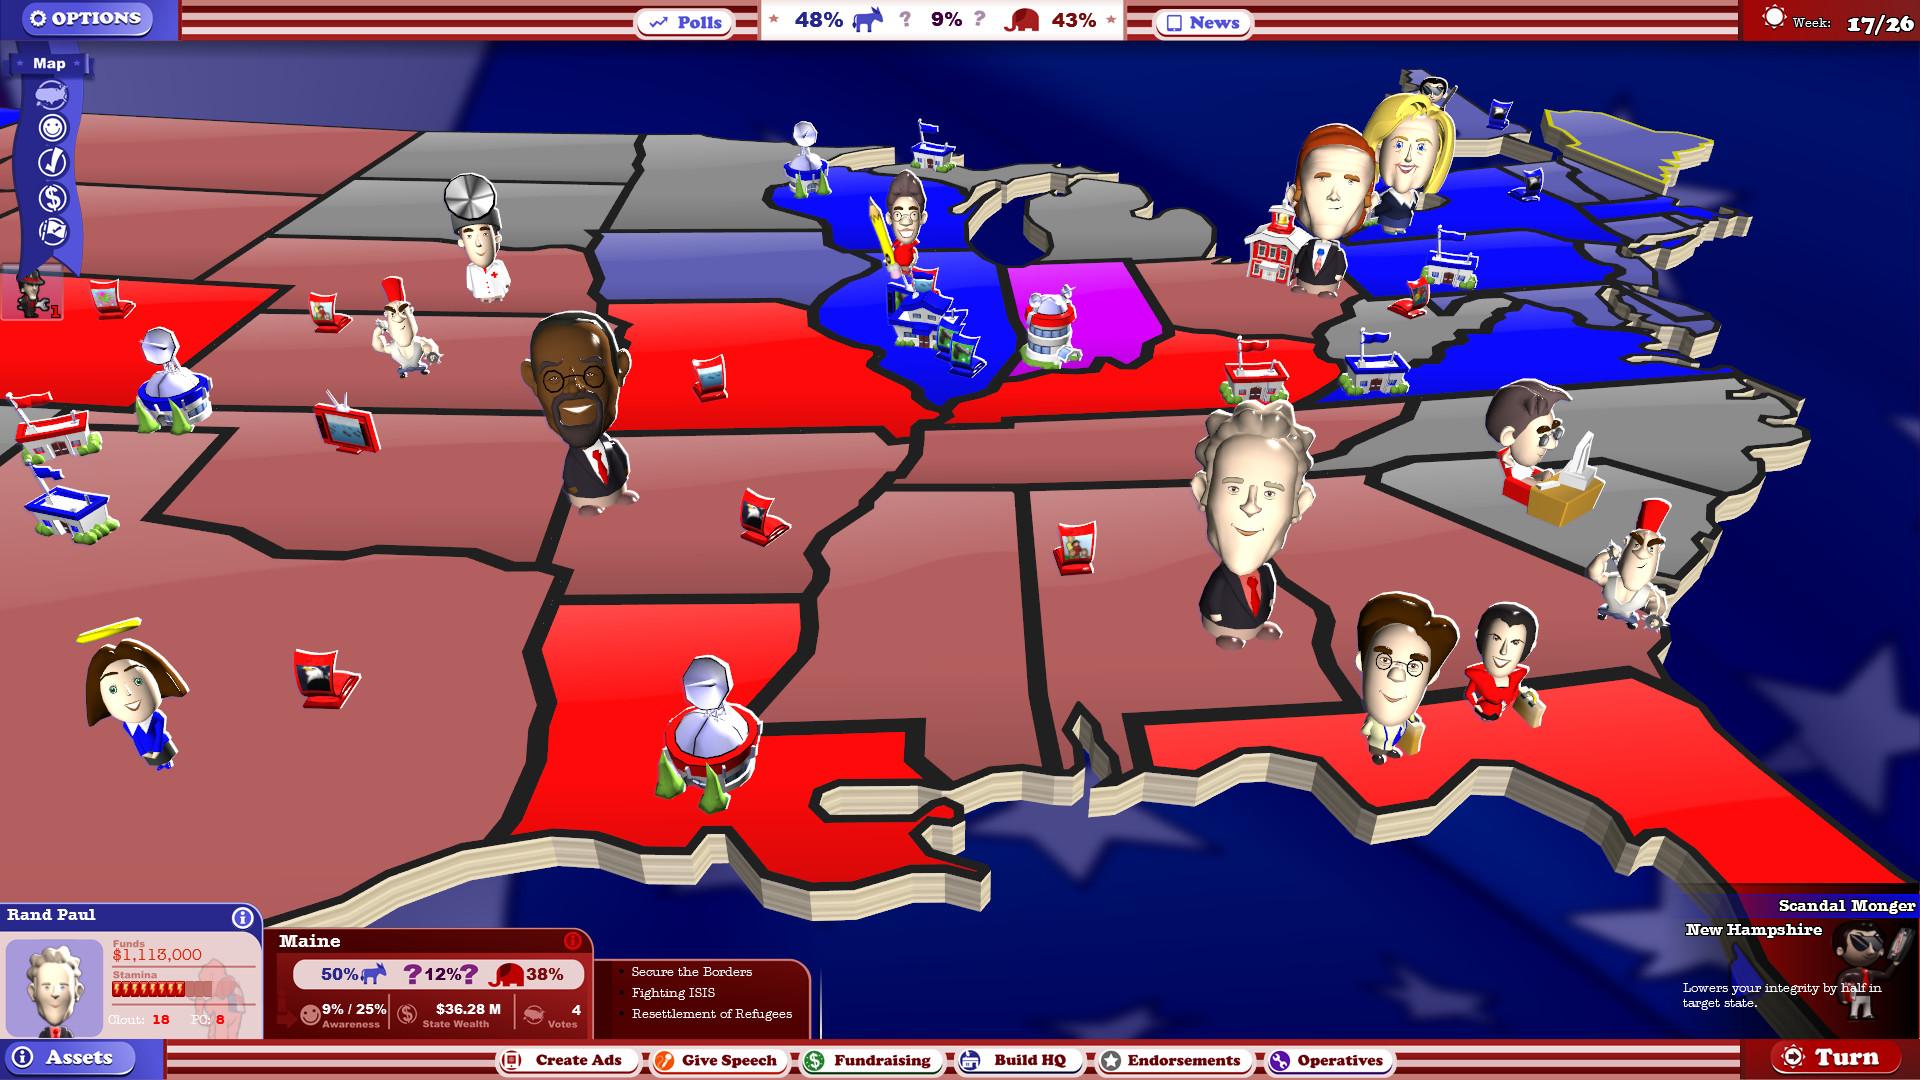 The Political Machine 2016 Screenshot 1